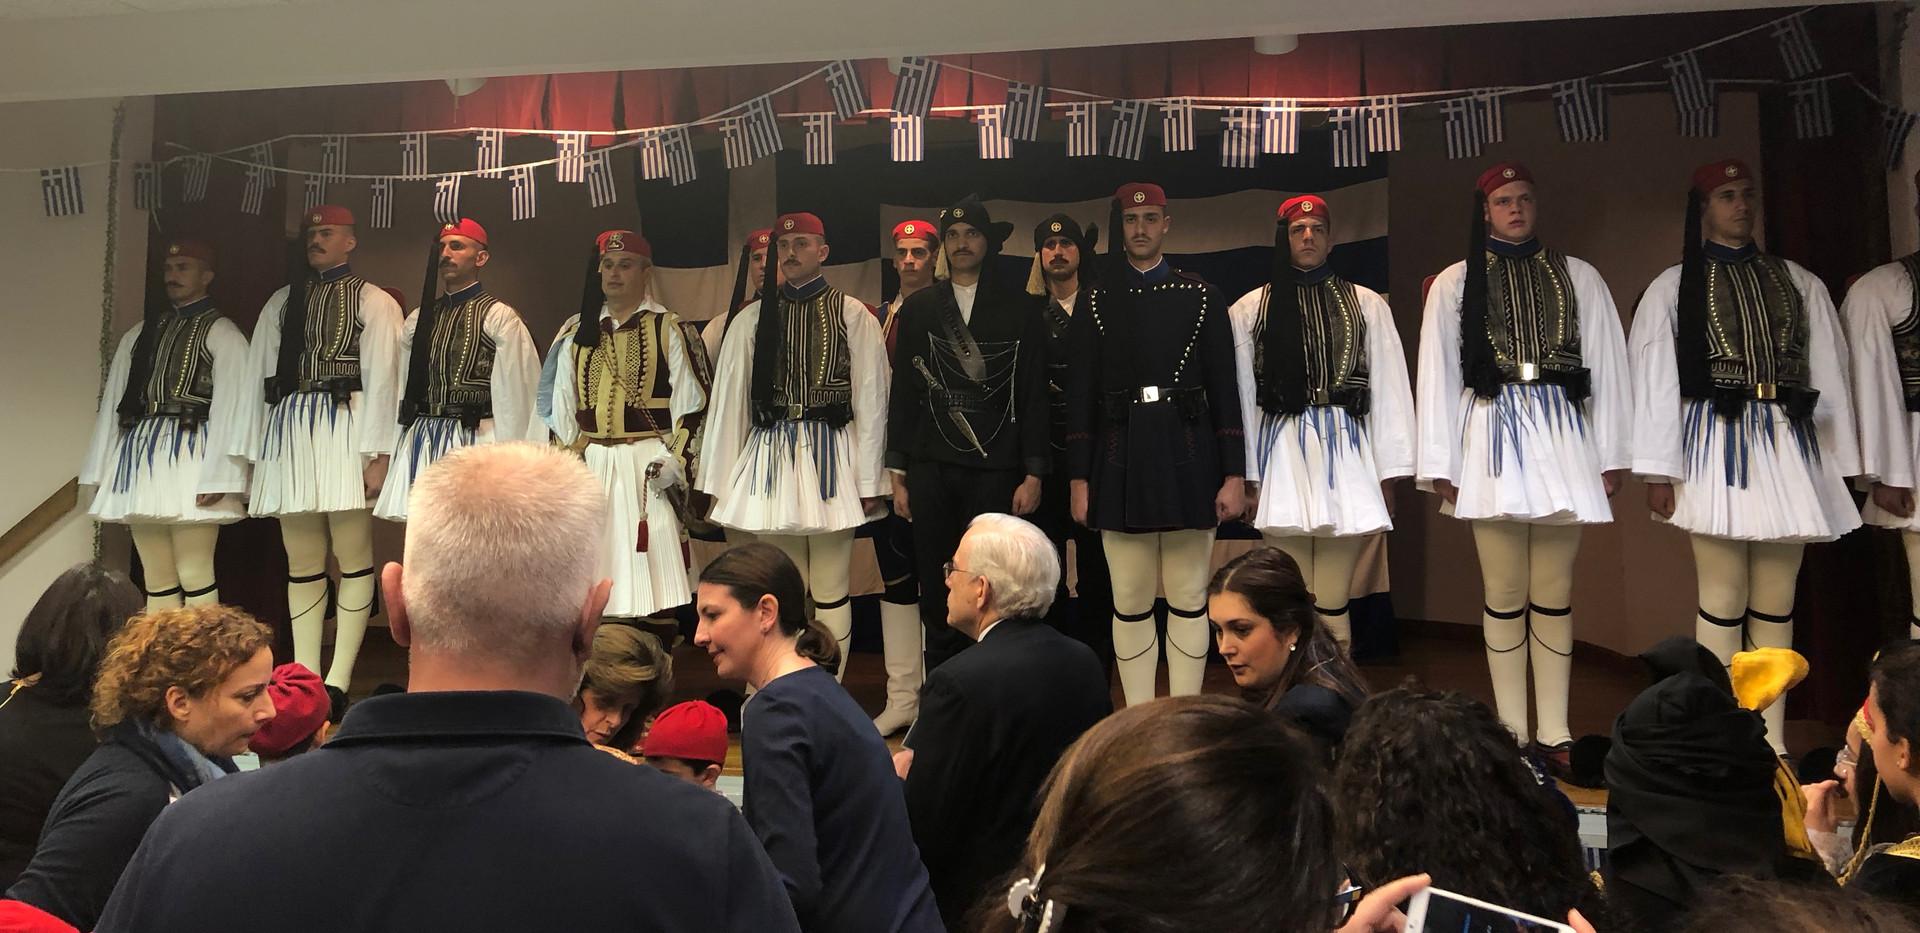 2019 Evzone Celebration (7).JPG